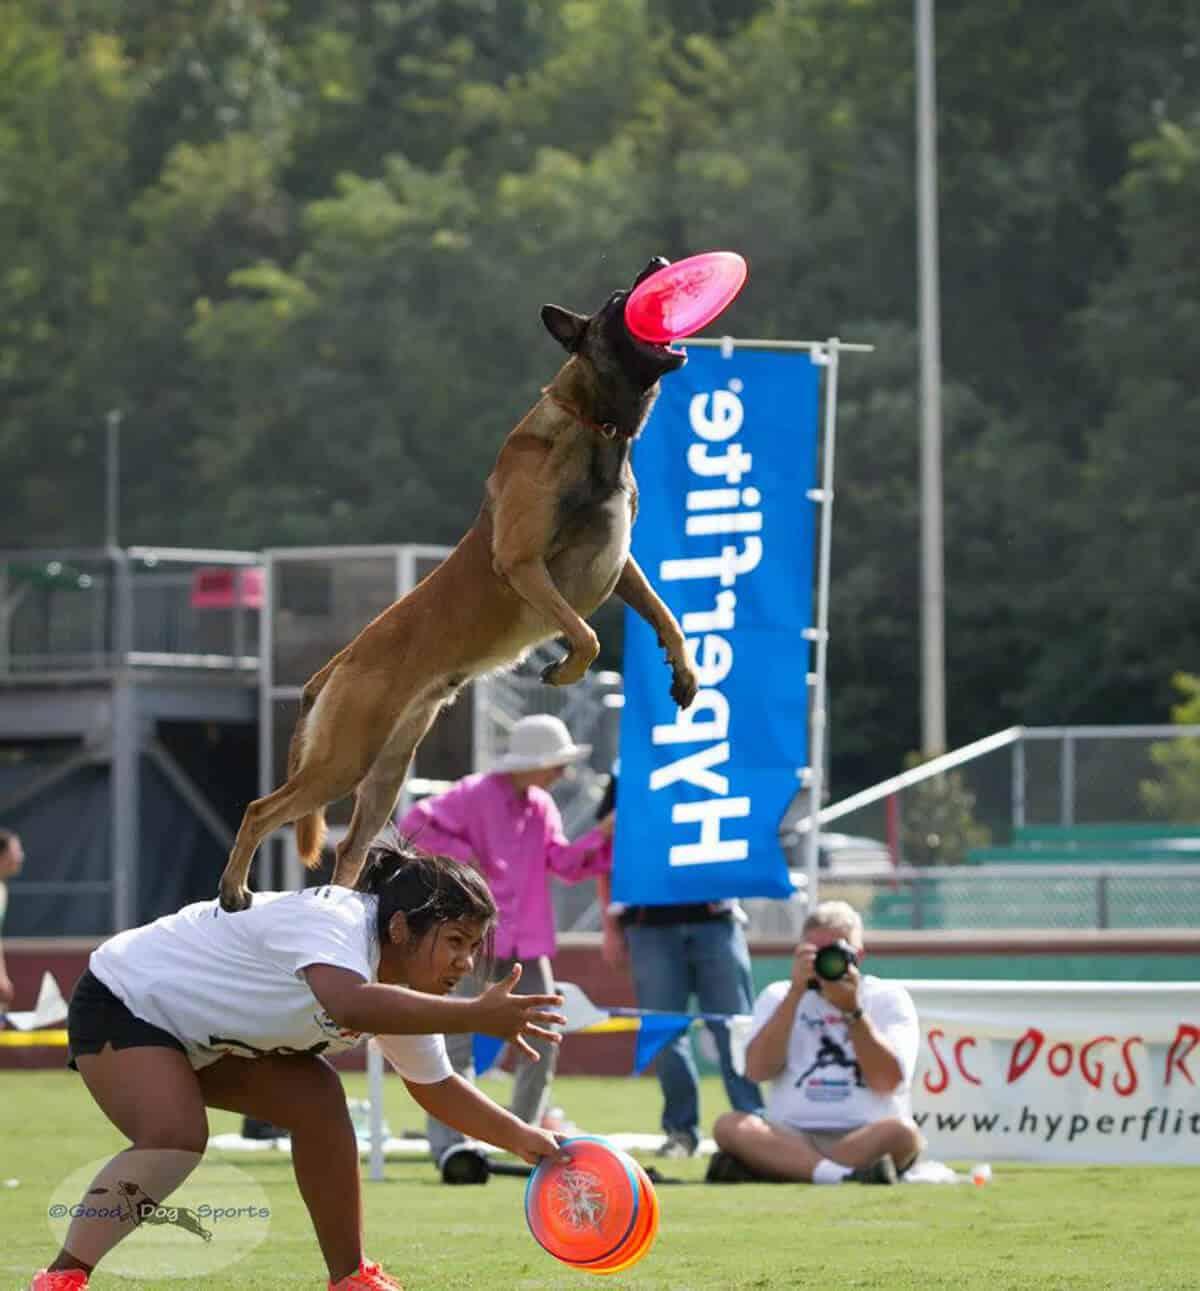 Malinois Dog catching a Frisbee